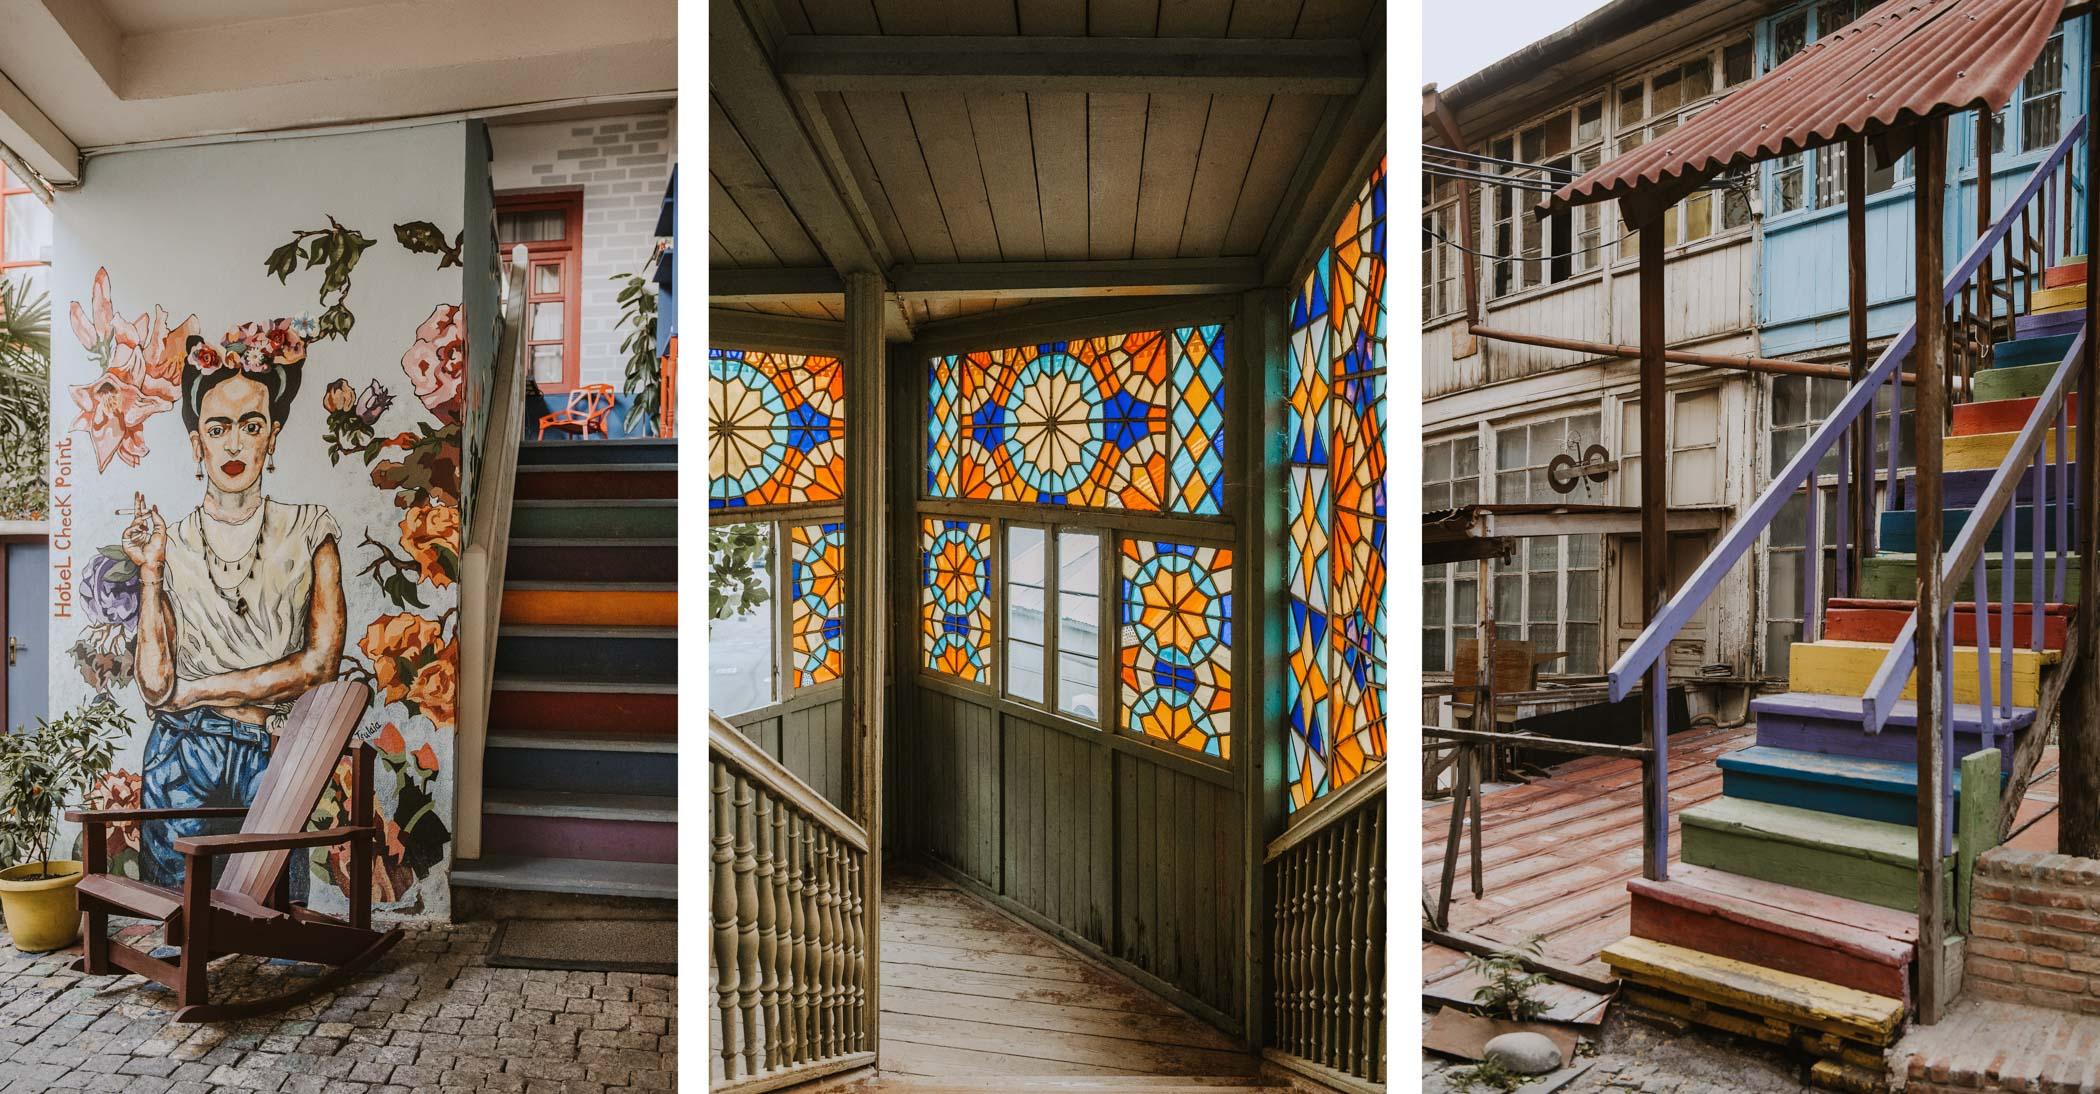 Stare Miasto wTbilisi